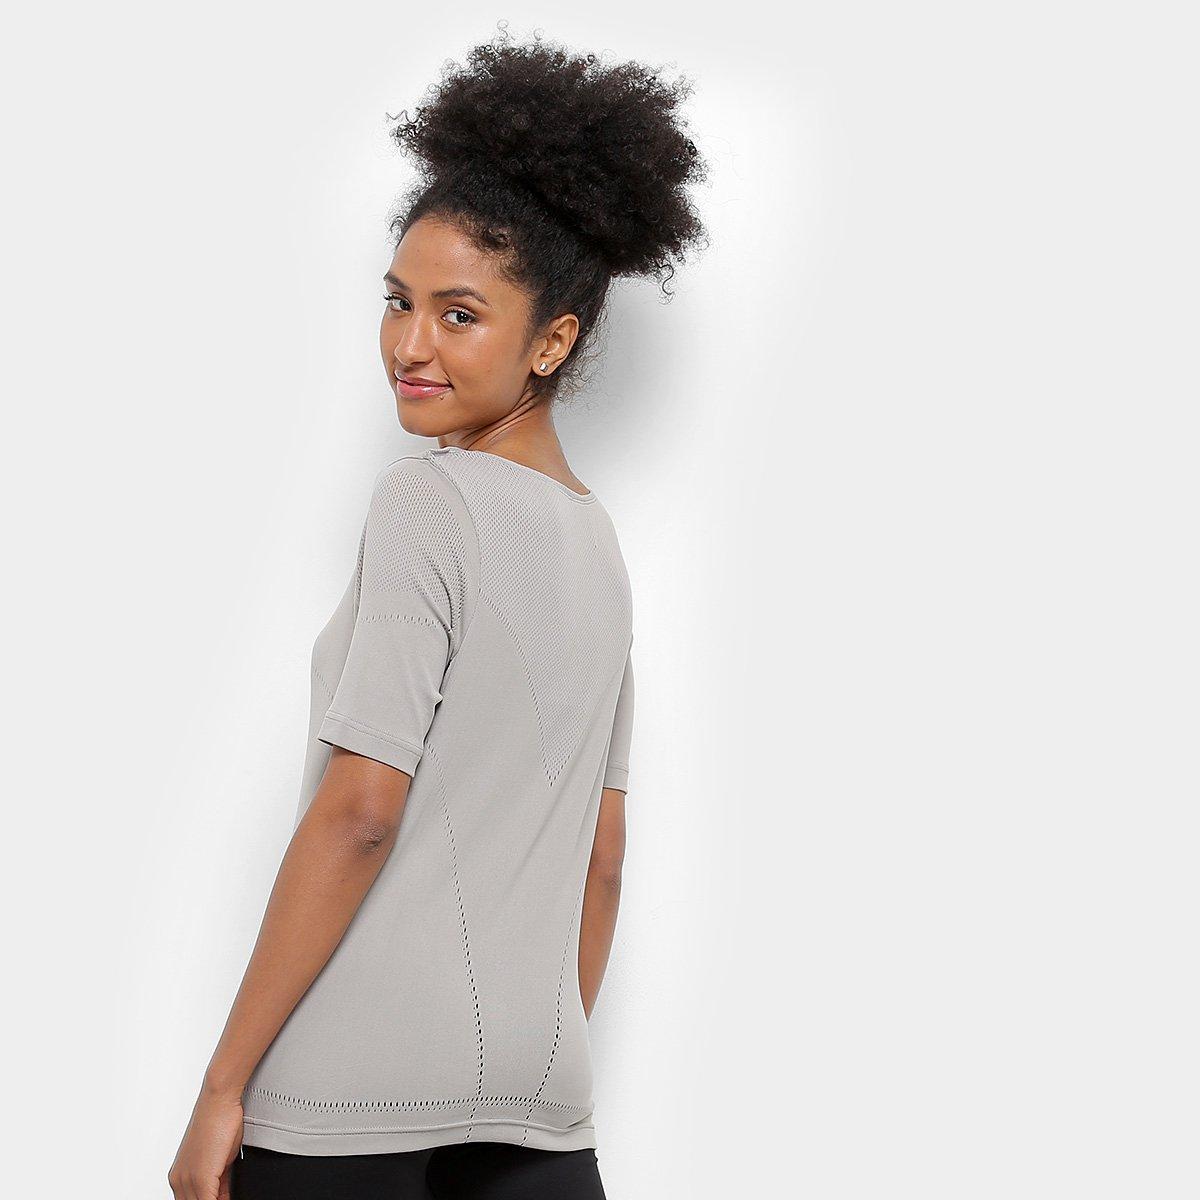 Seamless Areia Camiseta Camiseta Puma Evoknit Evoknit Puma Feminina nE0X60q